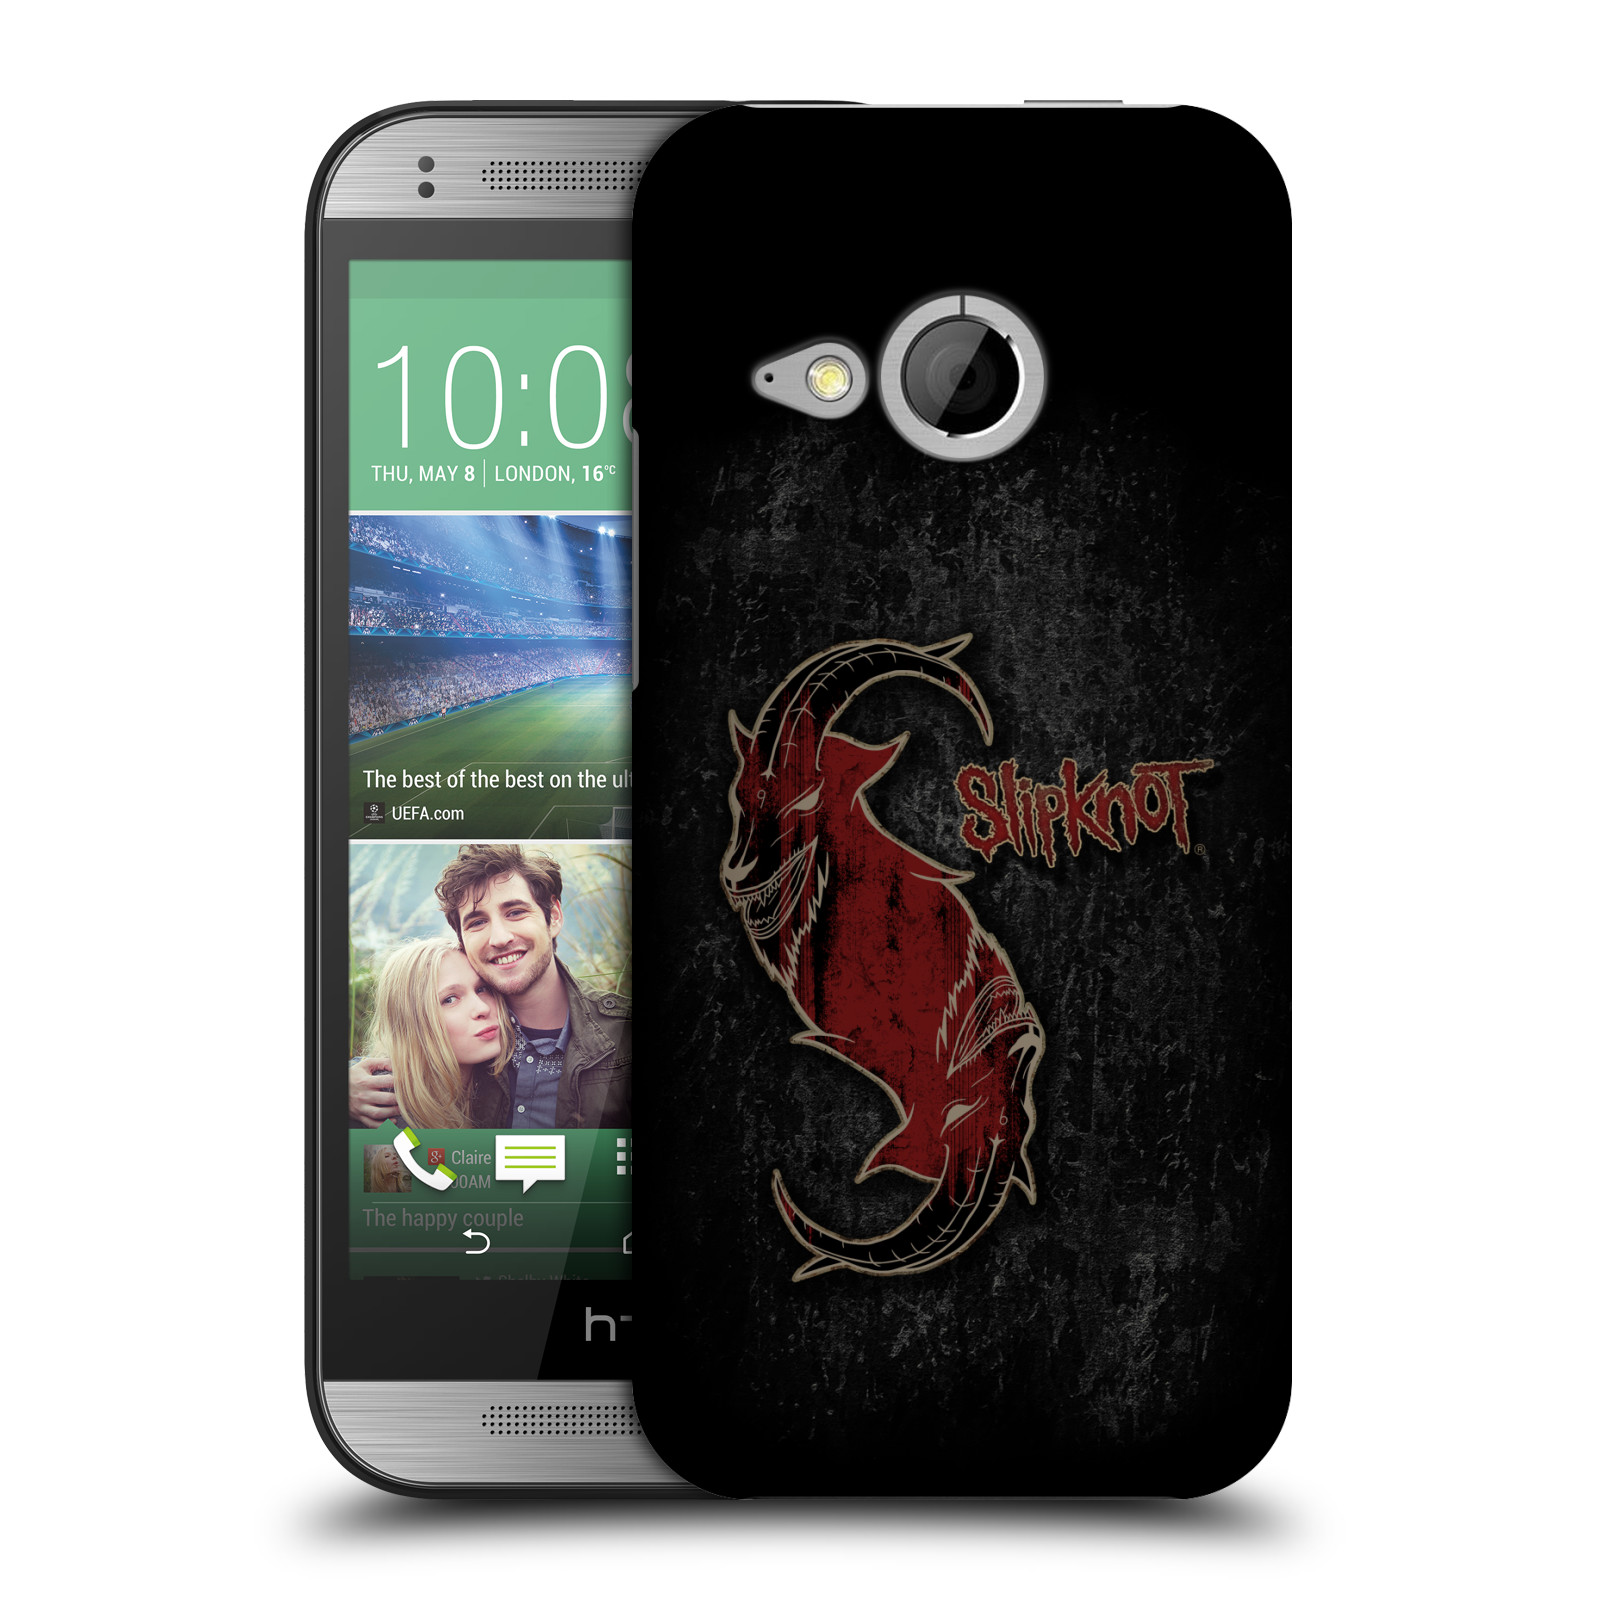 Plastové pouzdro na mobil HTC ONE Mini 2 HEAD CASE Slipknot - Rudý kozel